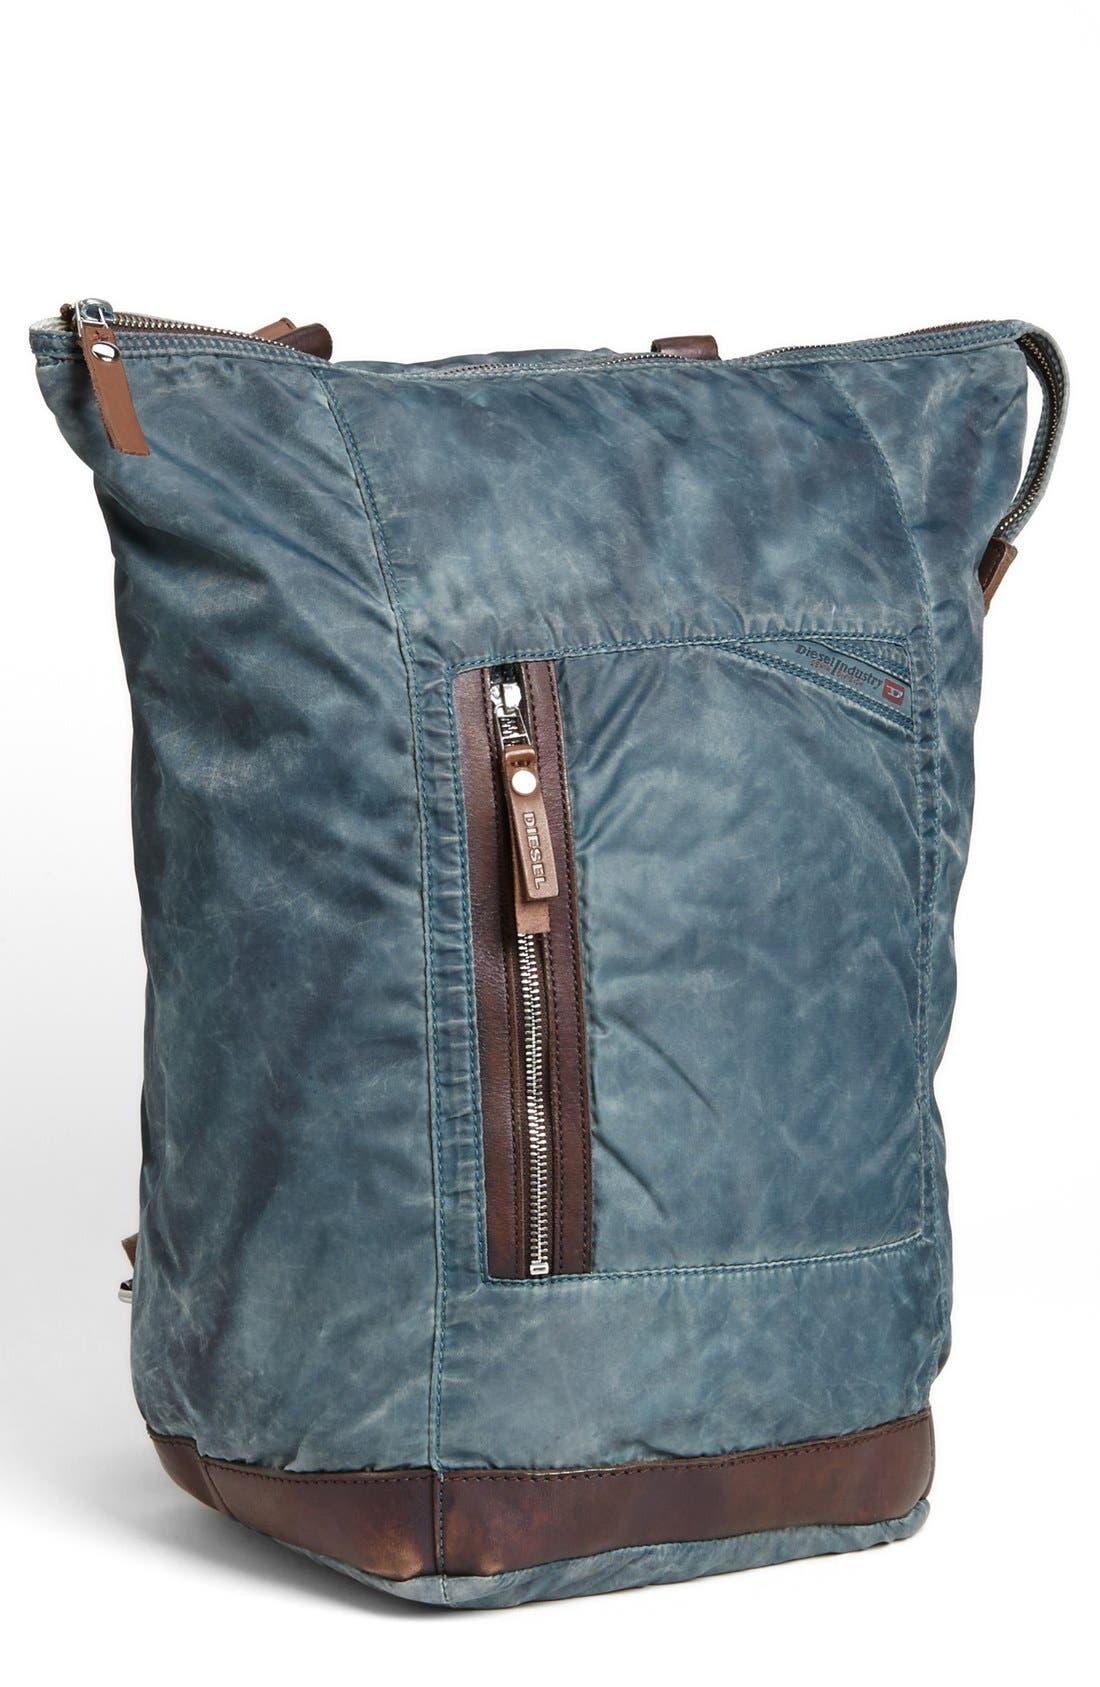 Alternate Image 1 Selected - DIESEL® 'The Brave Land' Backpack